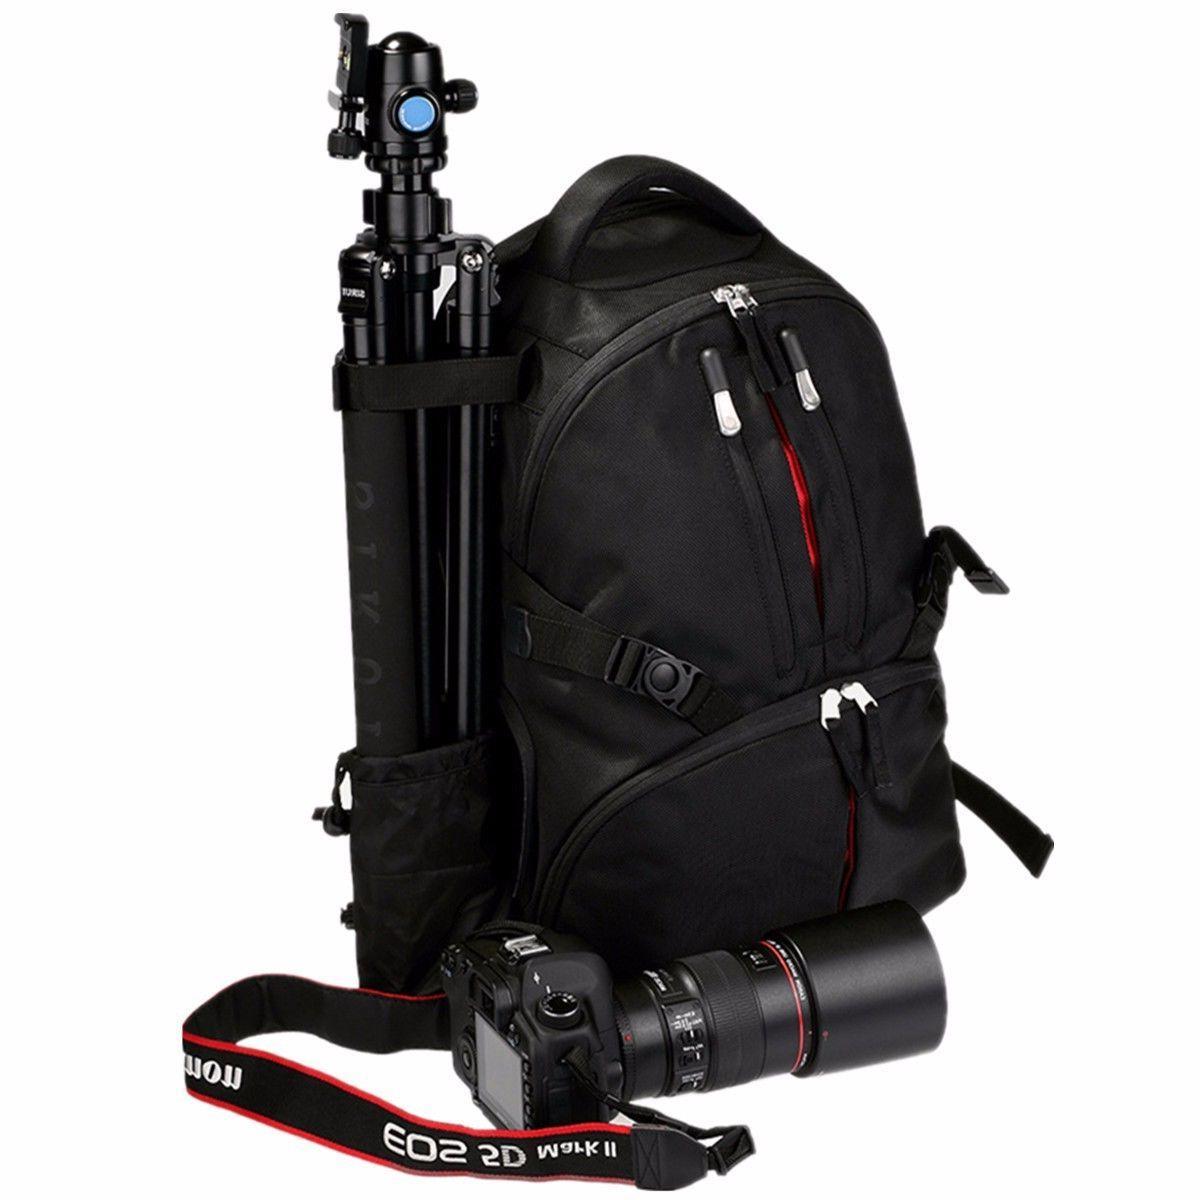 Waterproof Shockproof DSLR Camera Backpack Rucksack For Canon